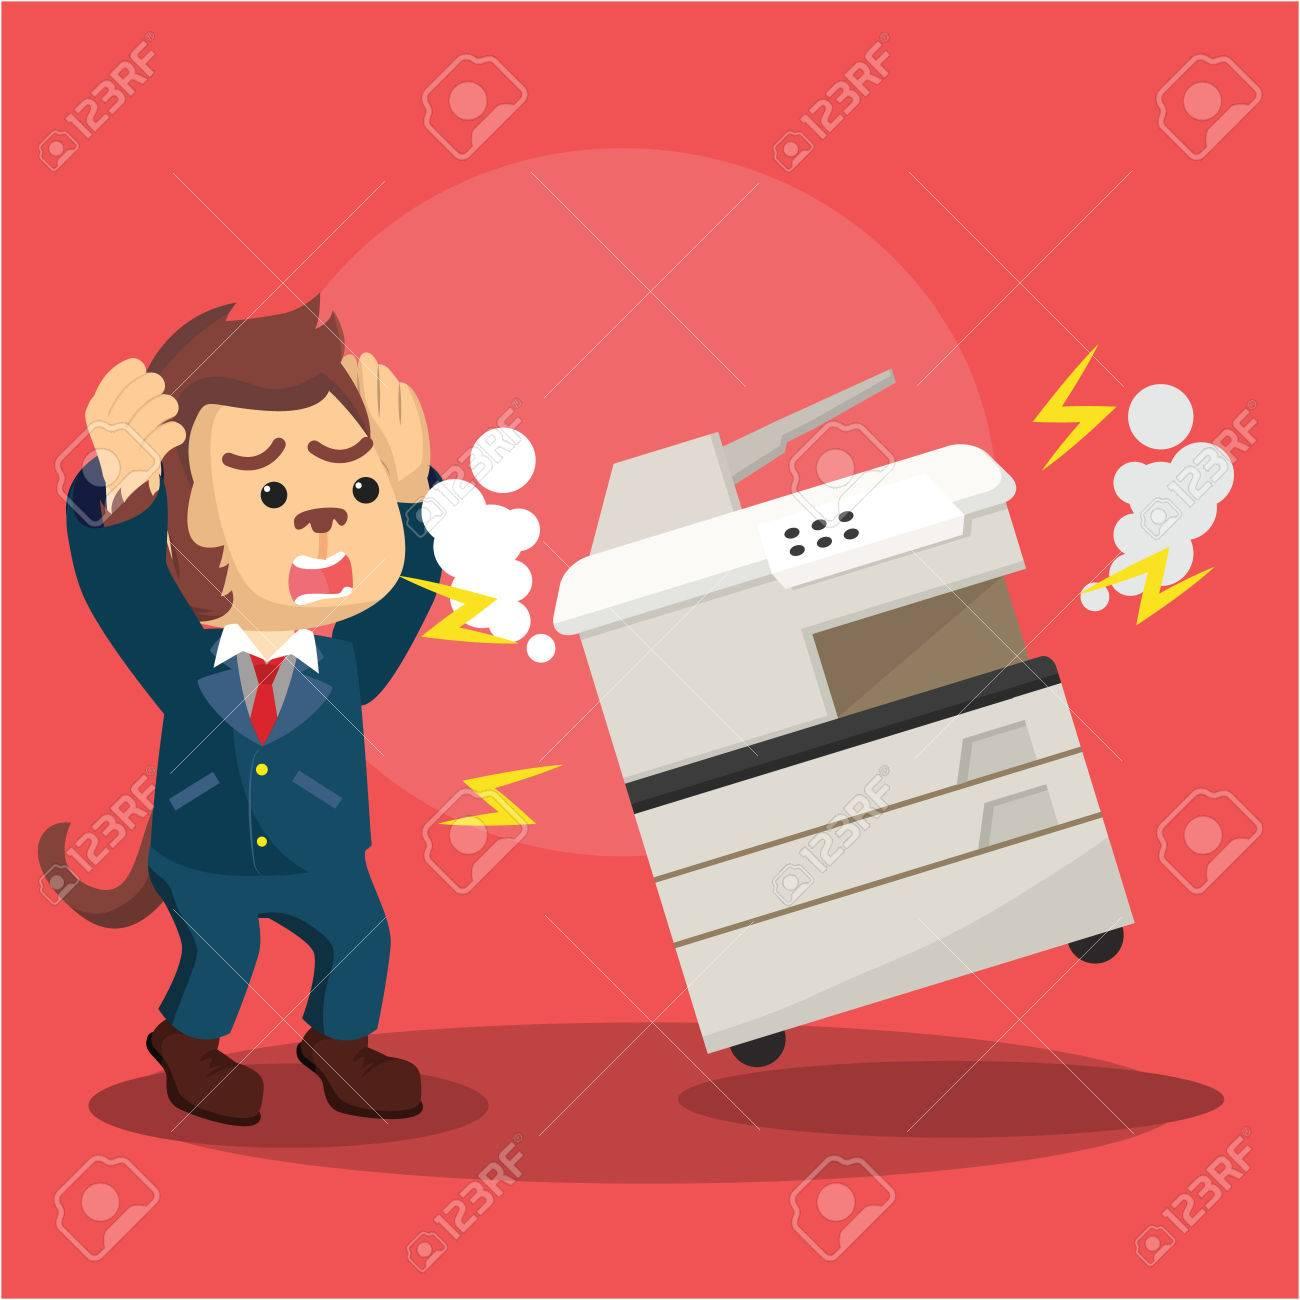 monkey business panic because broken photocopy machine.